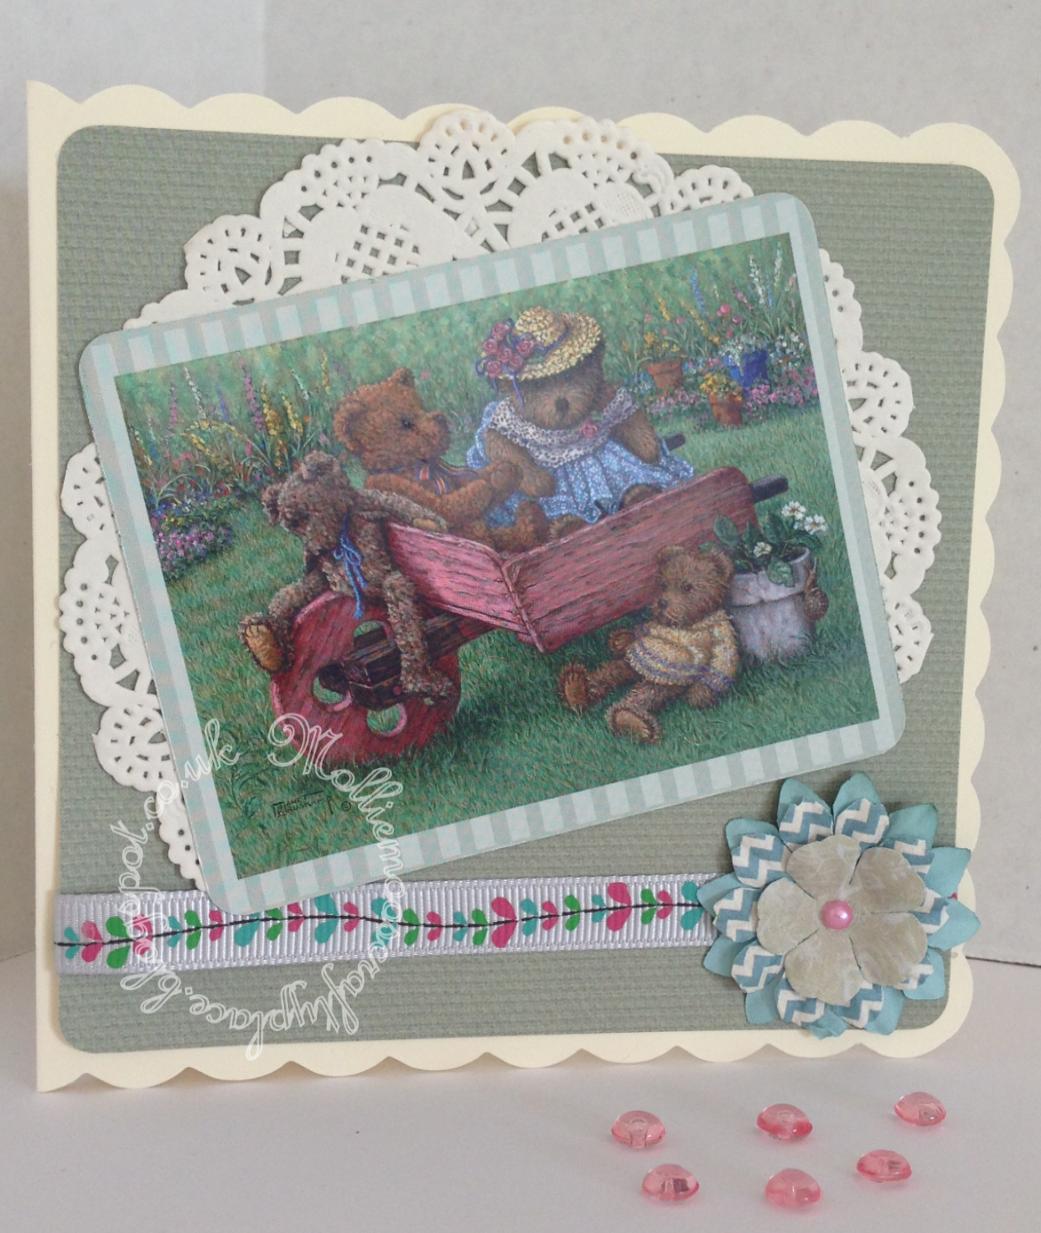 http://molliemooscraftyplace.blogspot.com/2014/09/teddy-bears-fun.html